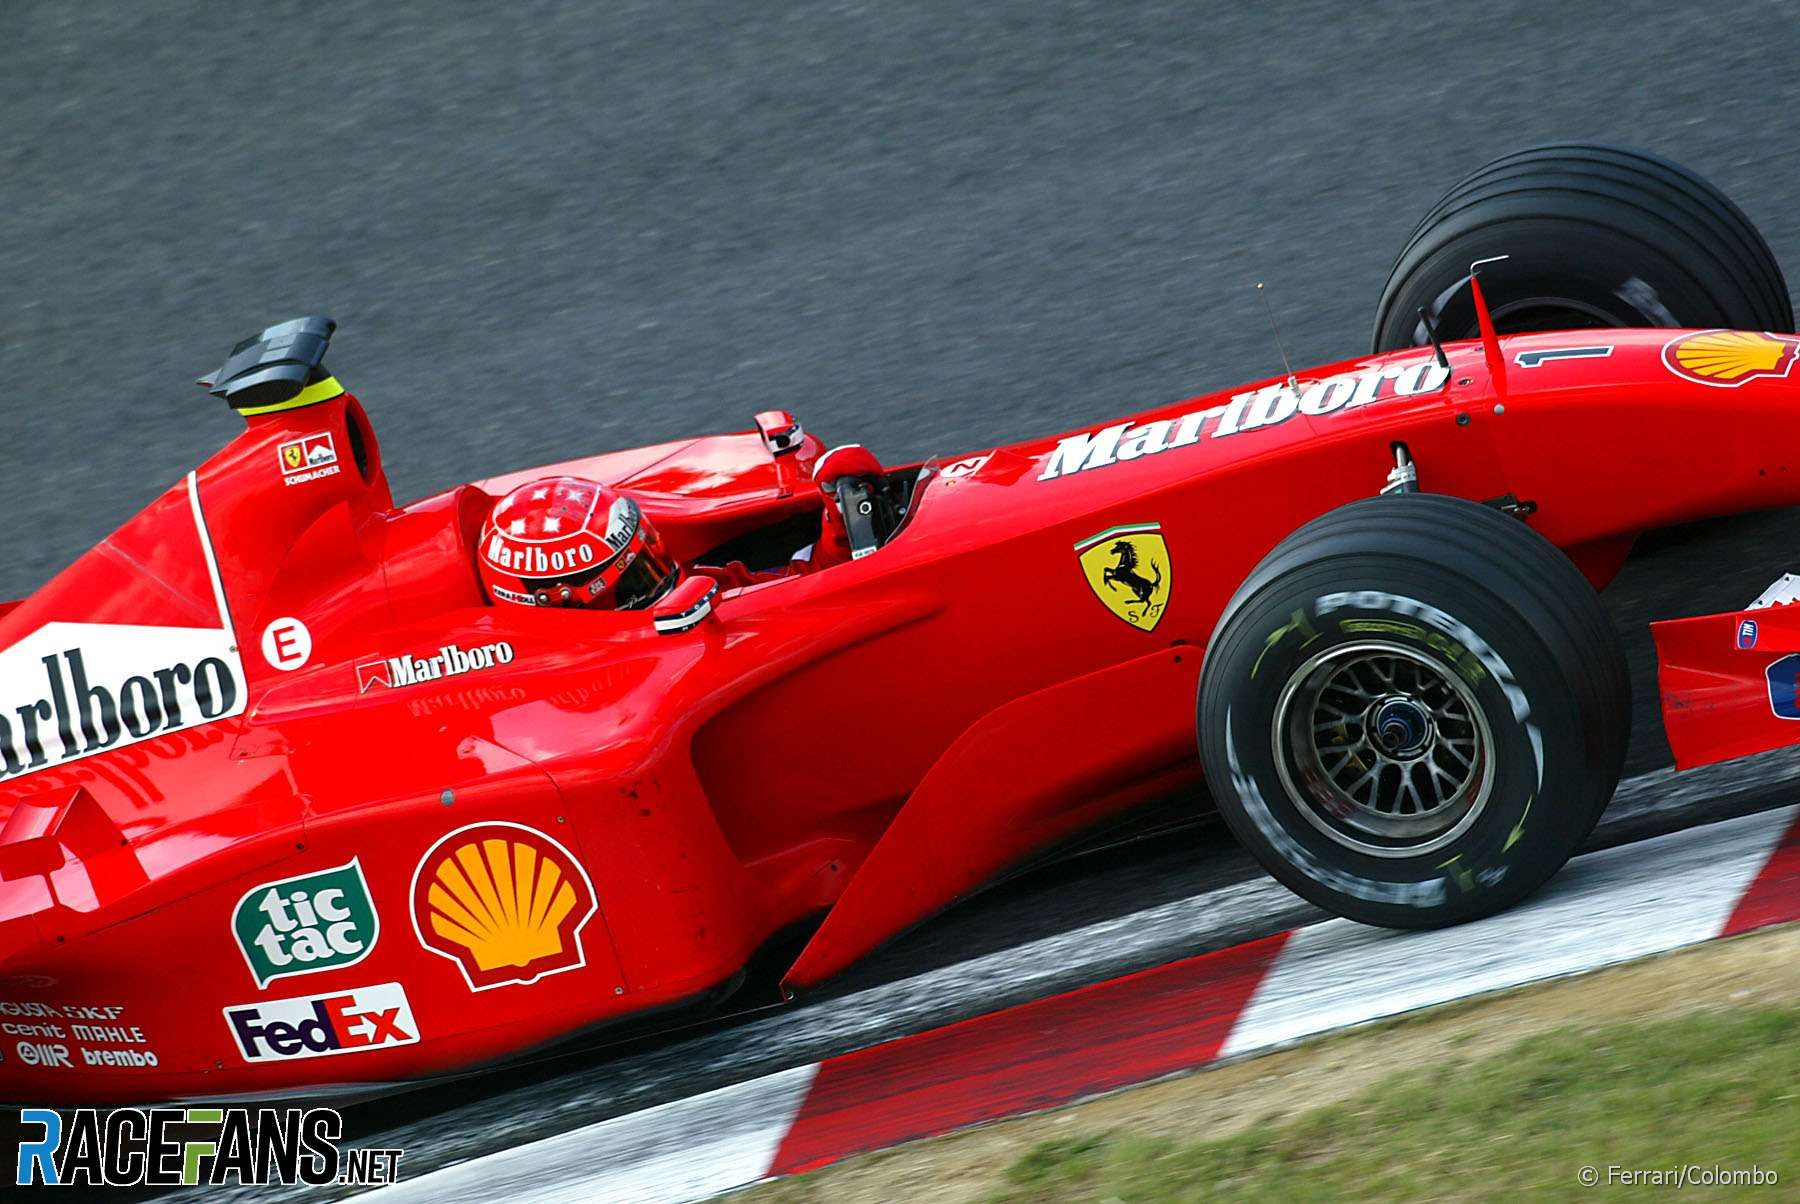 Michael Schumacher, Ferrari, 2001